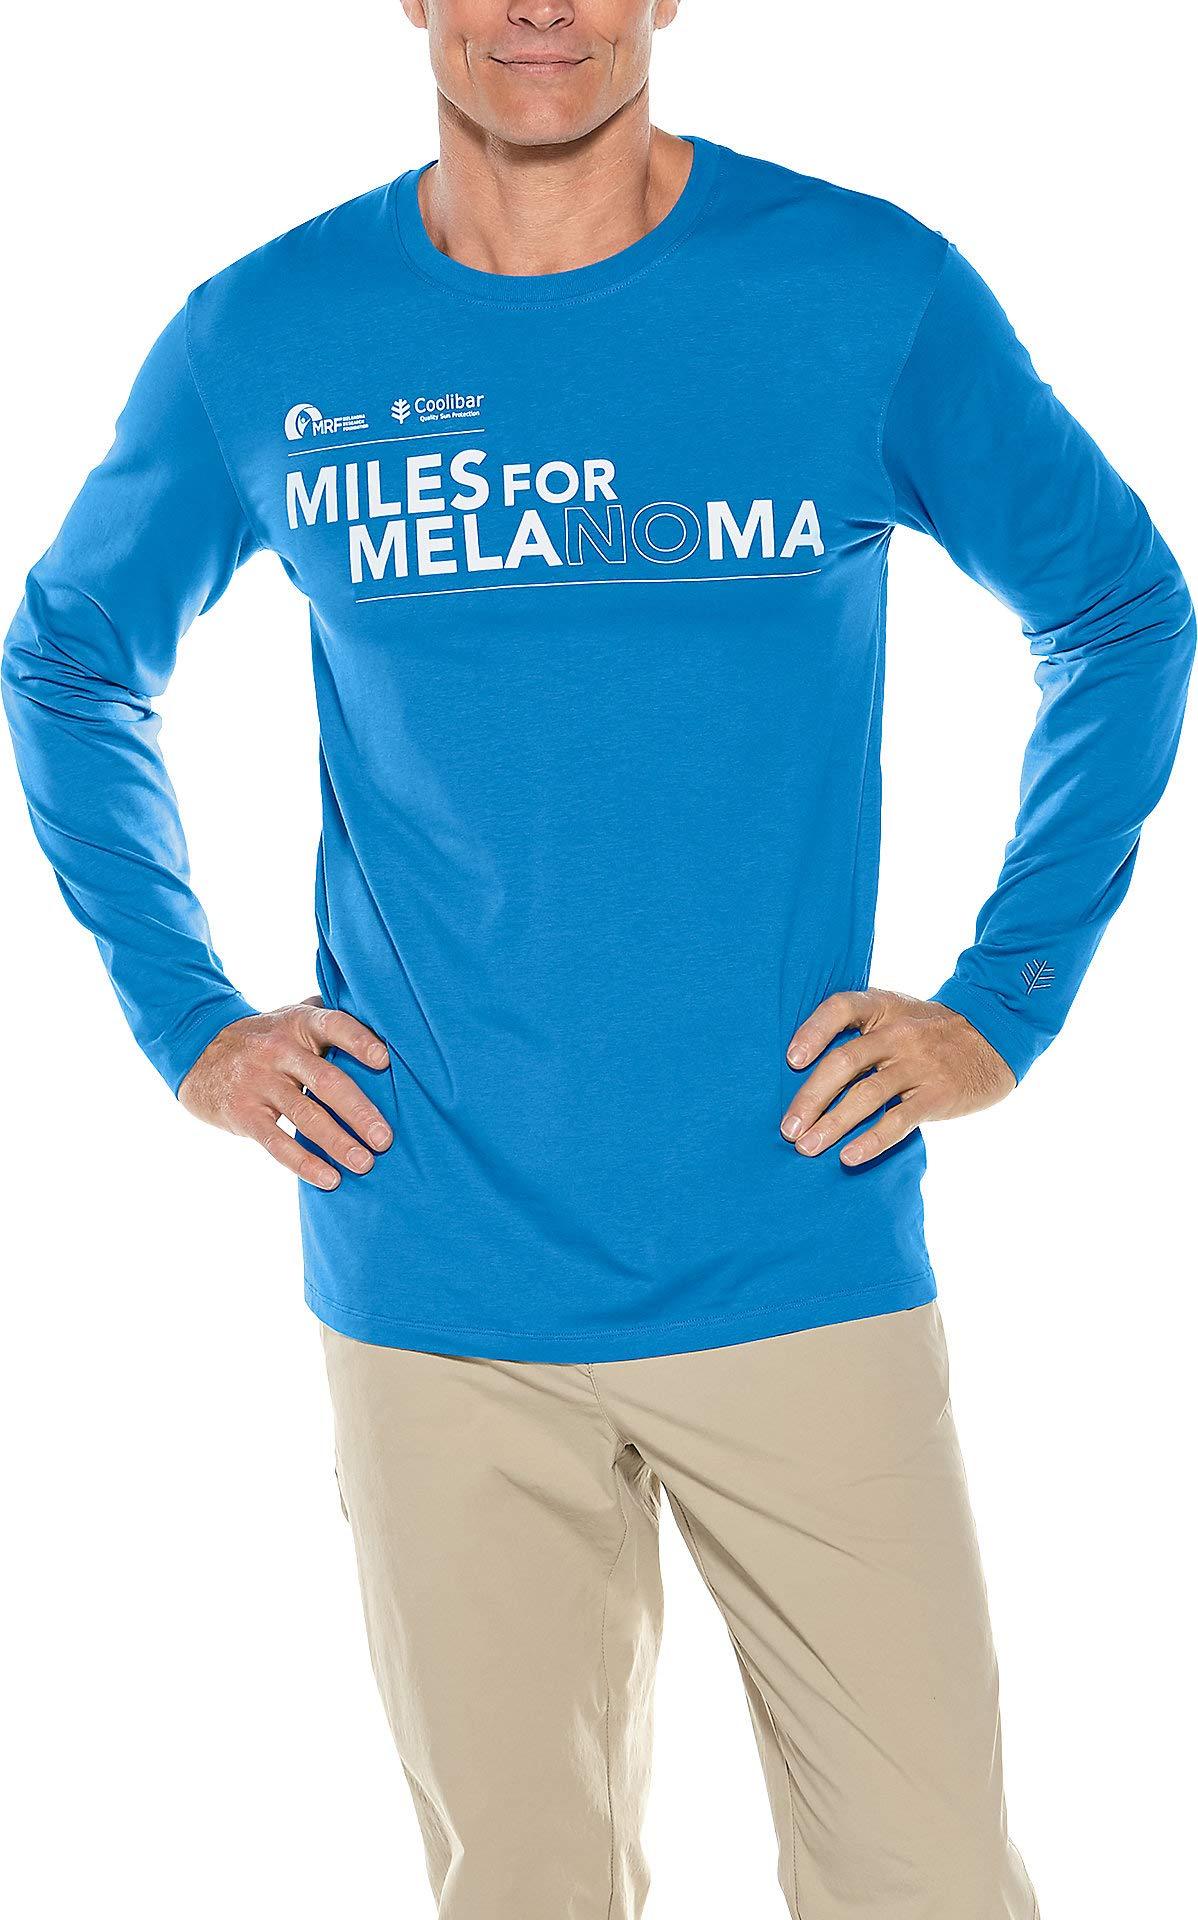 Coolibar UPF 50+ 2019 Miles for Melanoma Unisex T-Shirt - Sun Protective